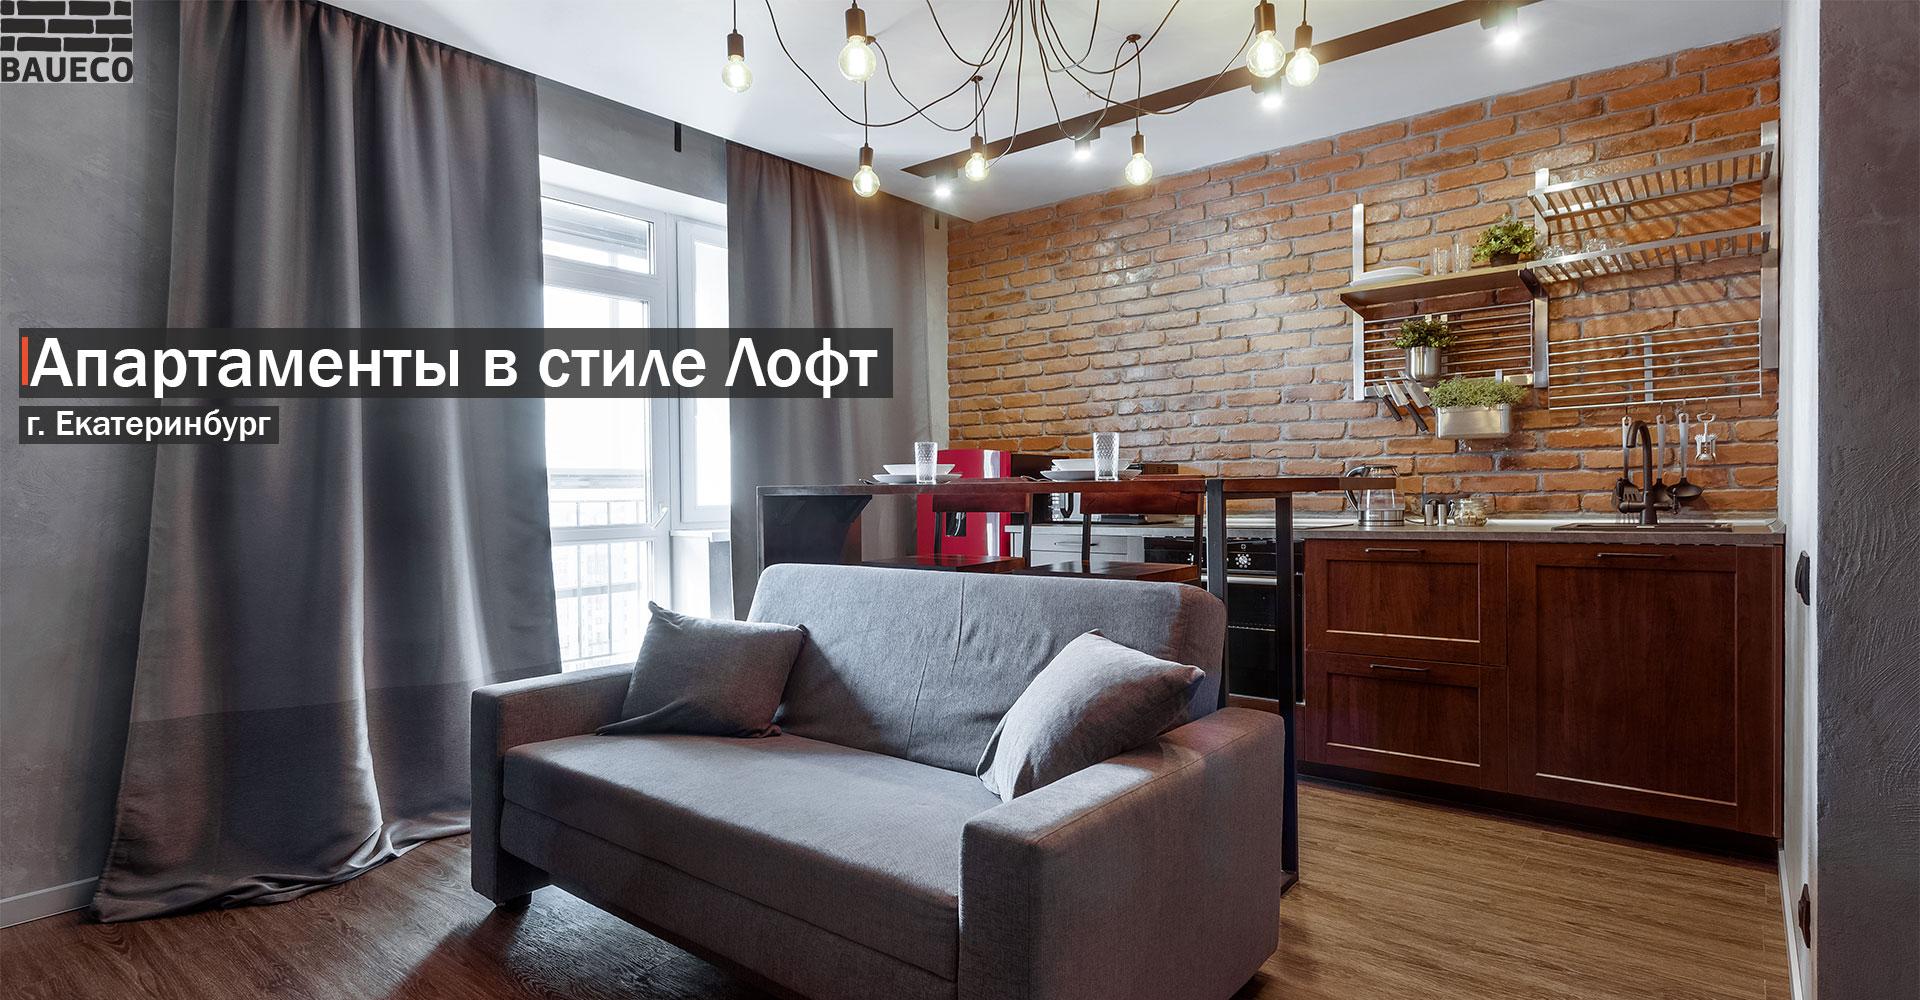 Апартаменты в стиле Лофт декоративный кирпич БауЭко